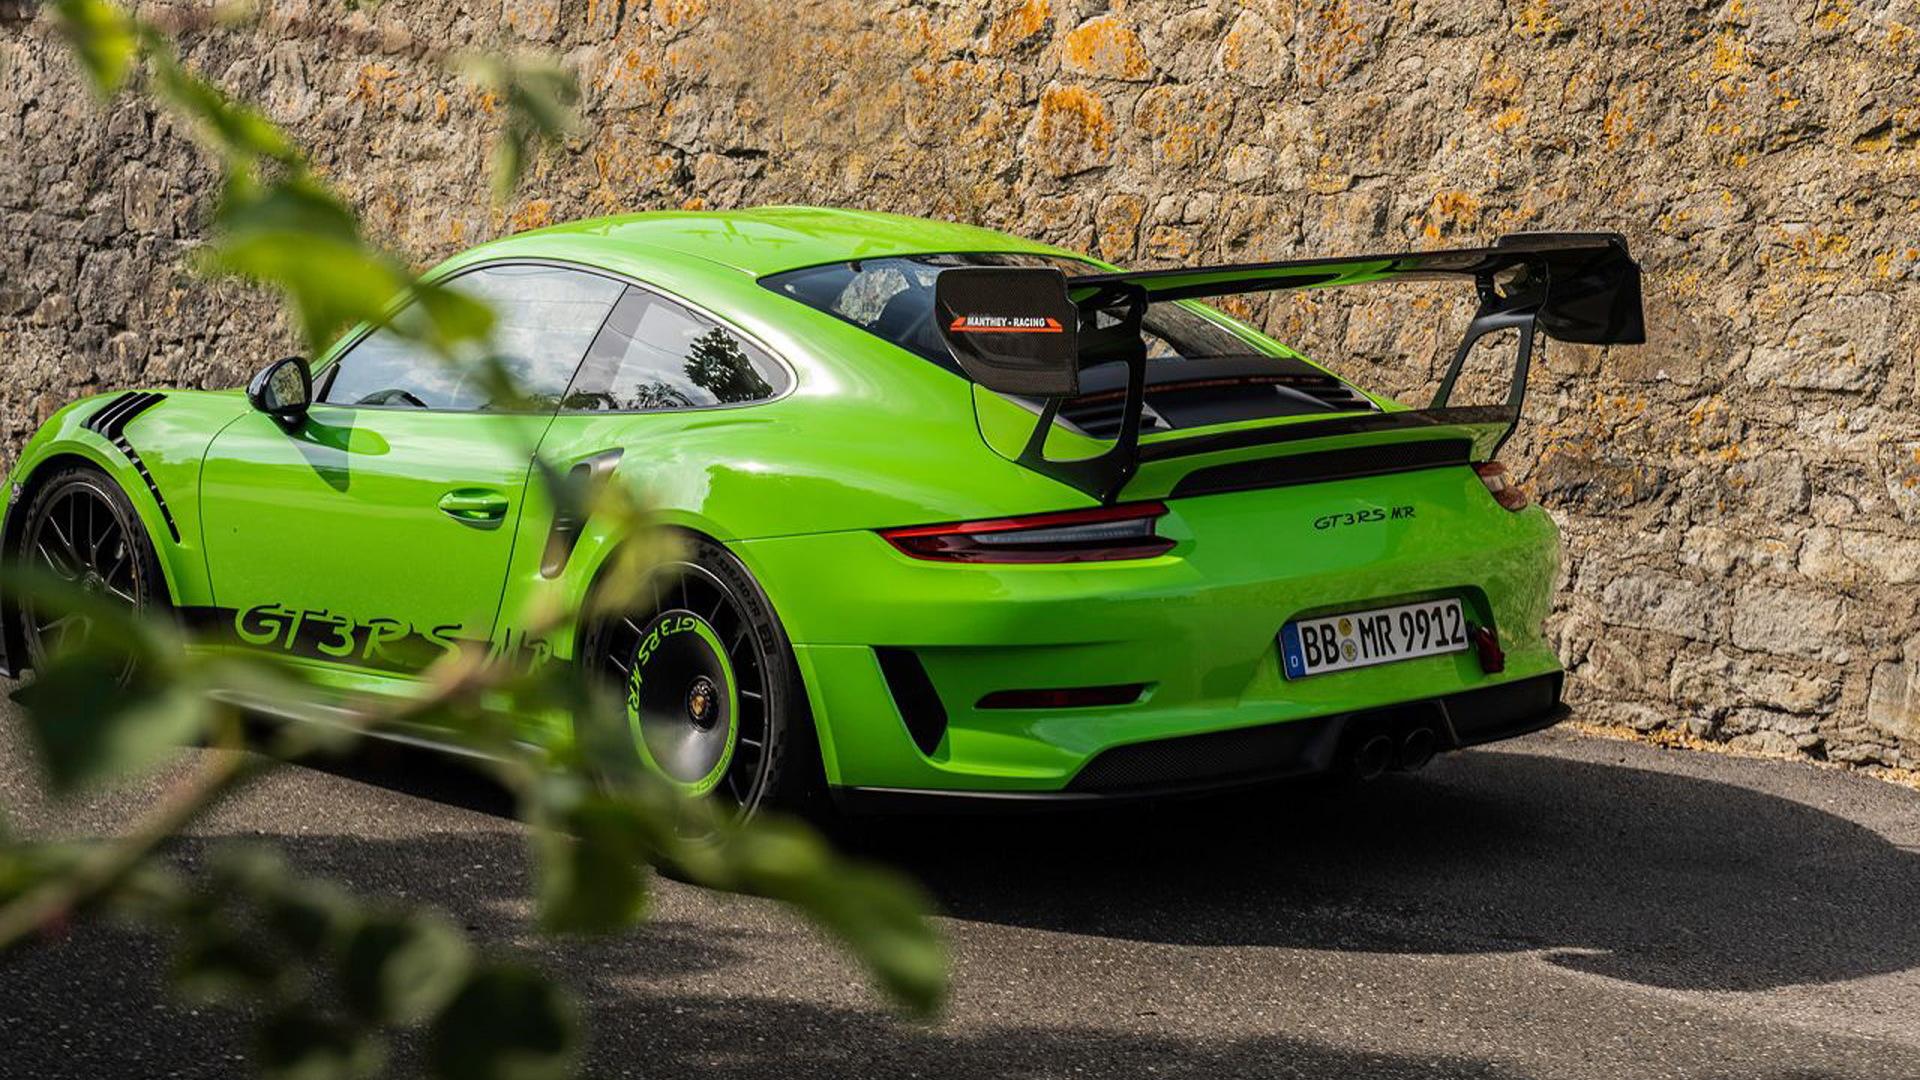 2019 Porsche 911 GT3 RS MR